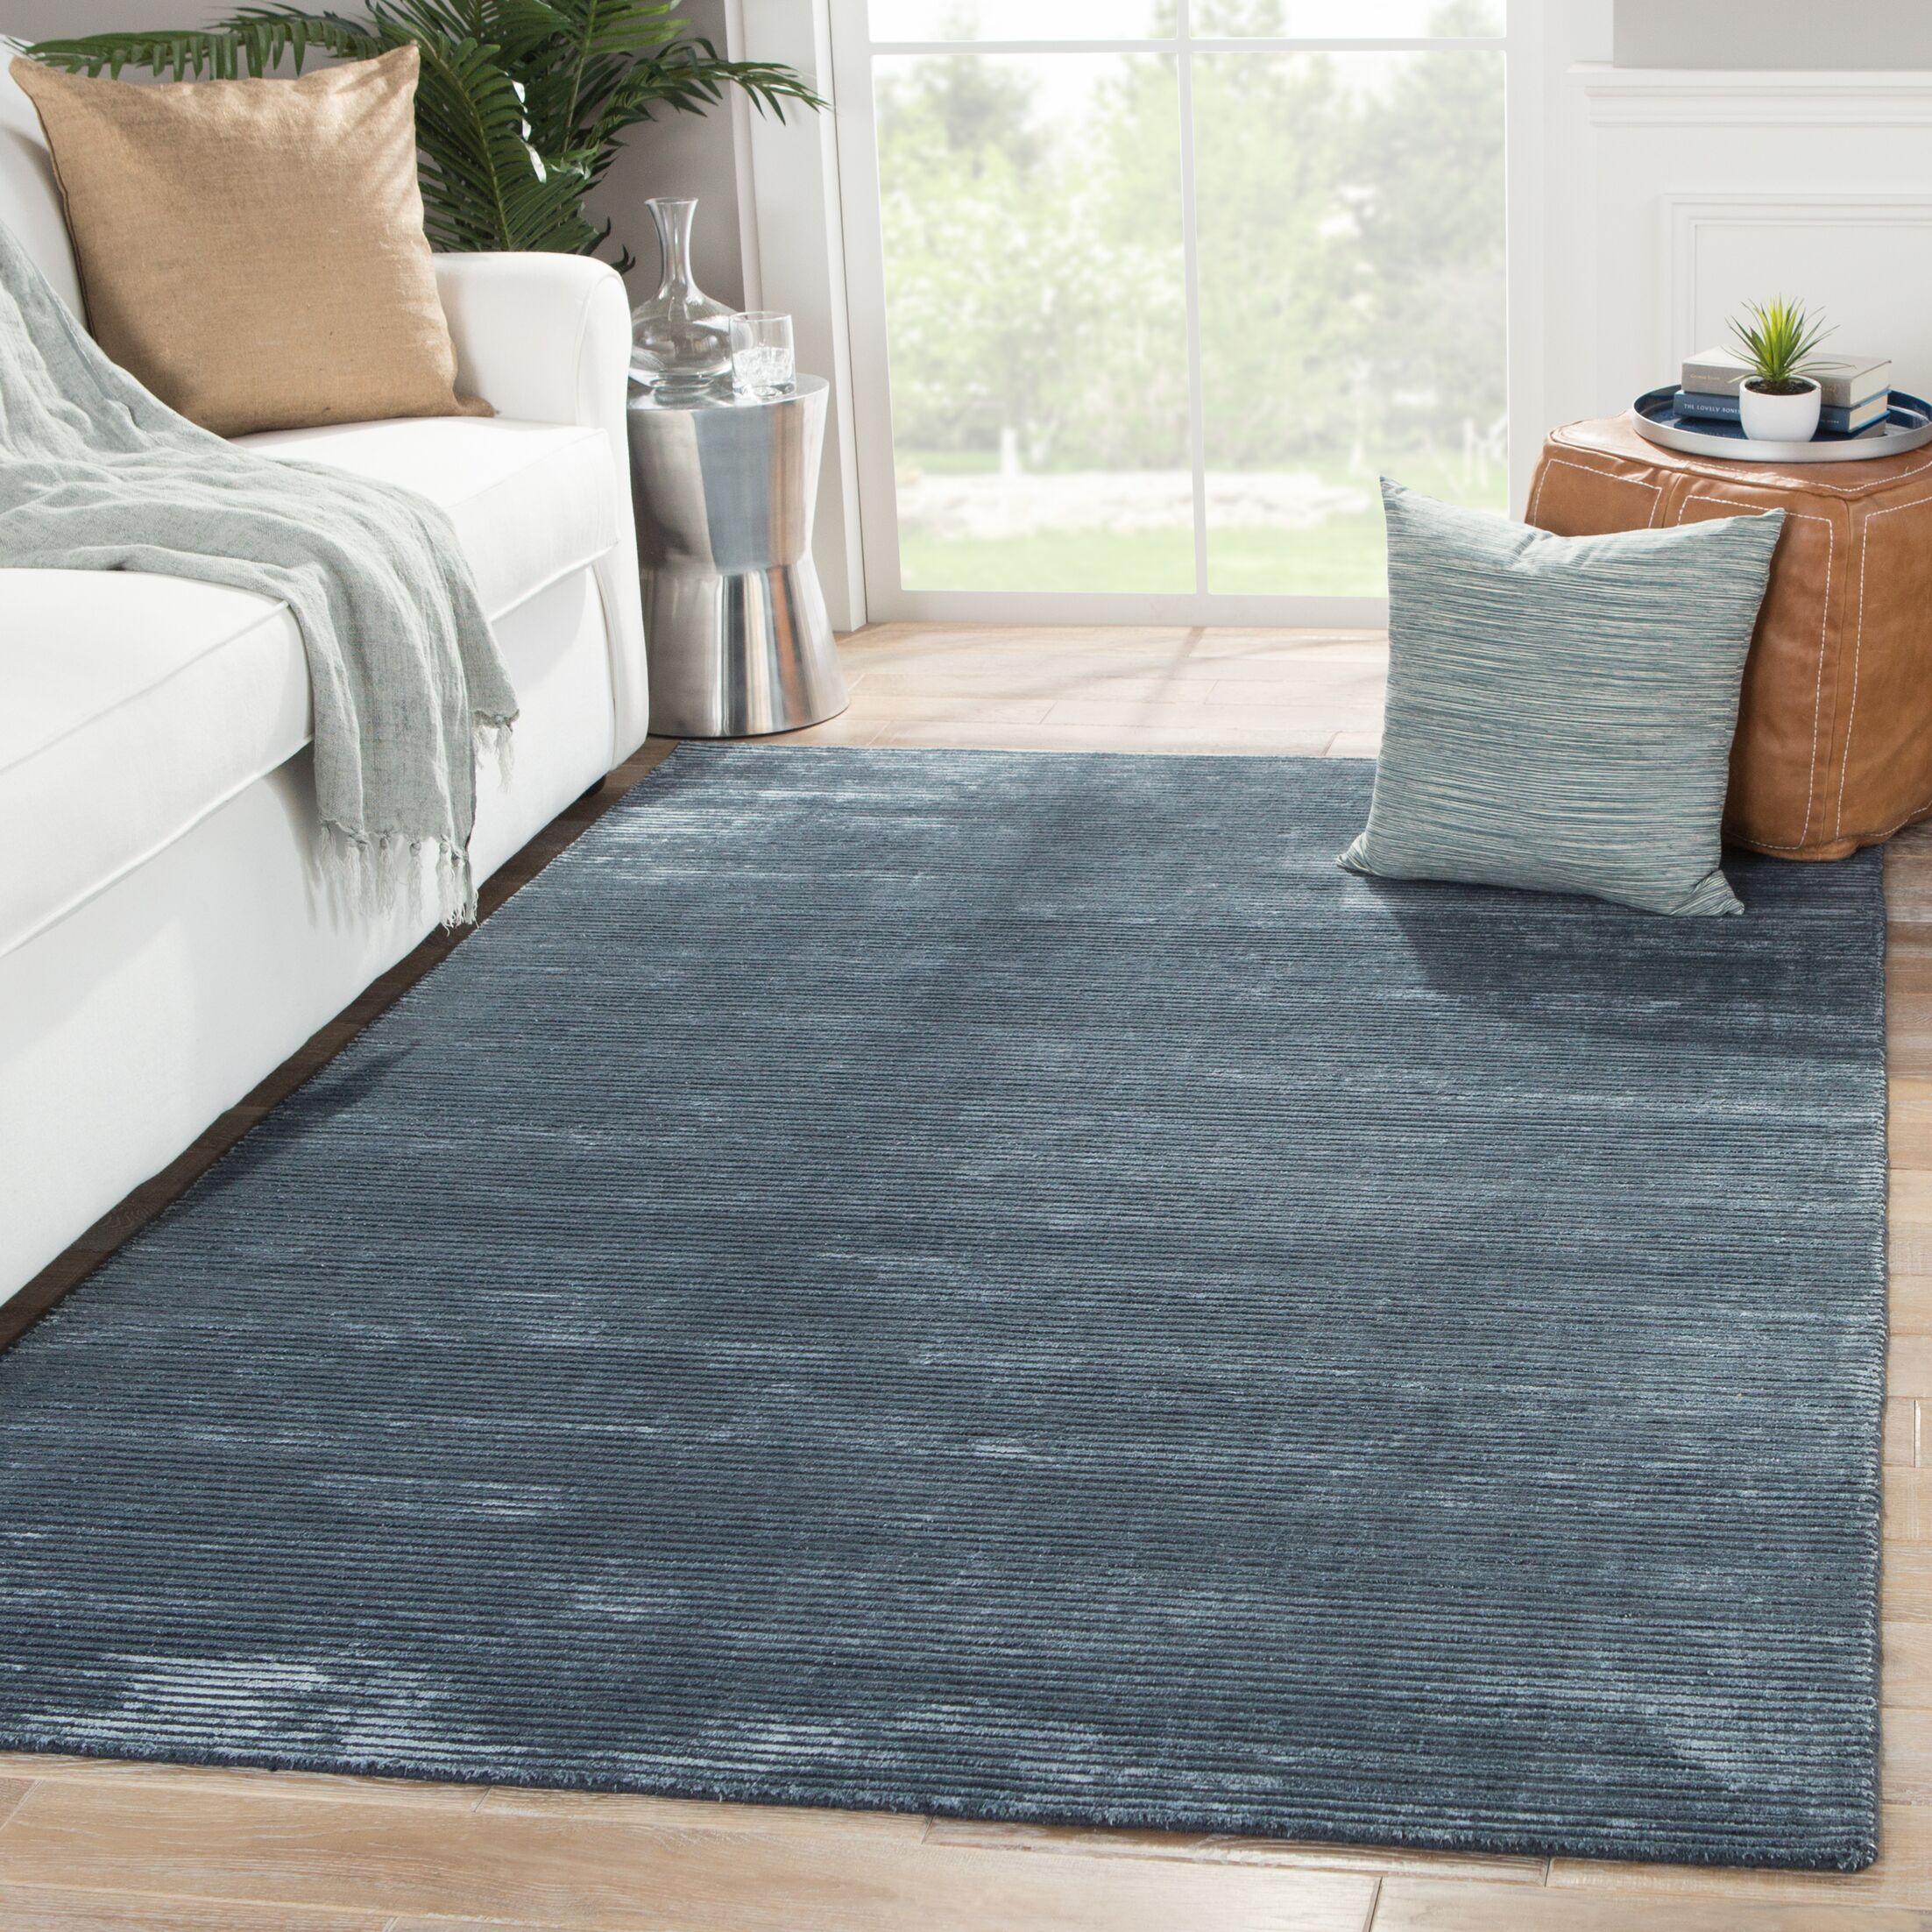 Nico Wool and Art Silk Solids/Handloom Moonlight Blue Area Rug Rug Size: 8' x 10'